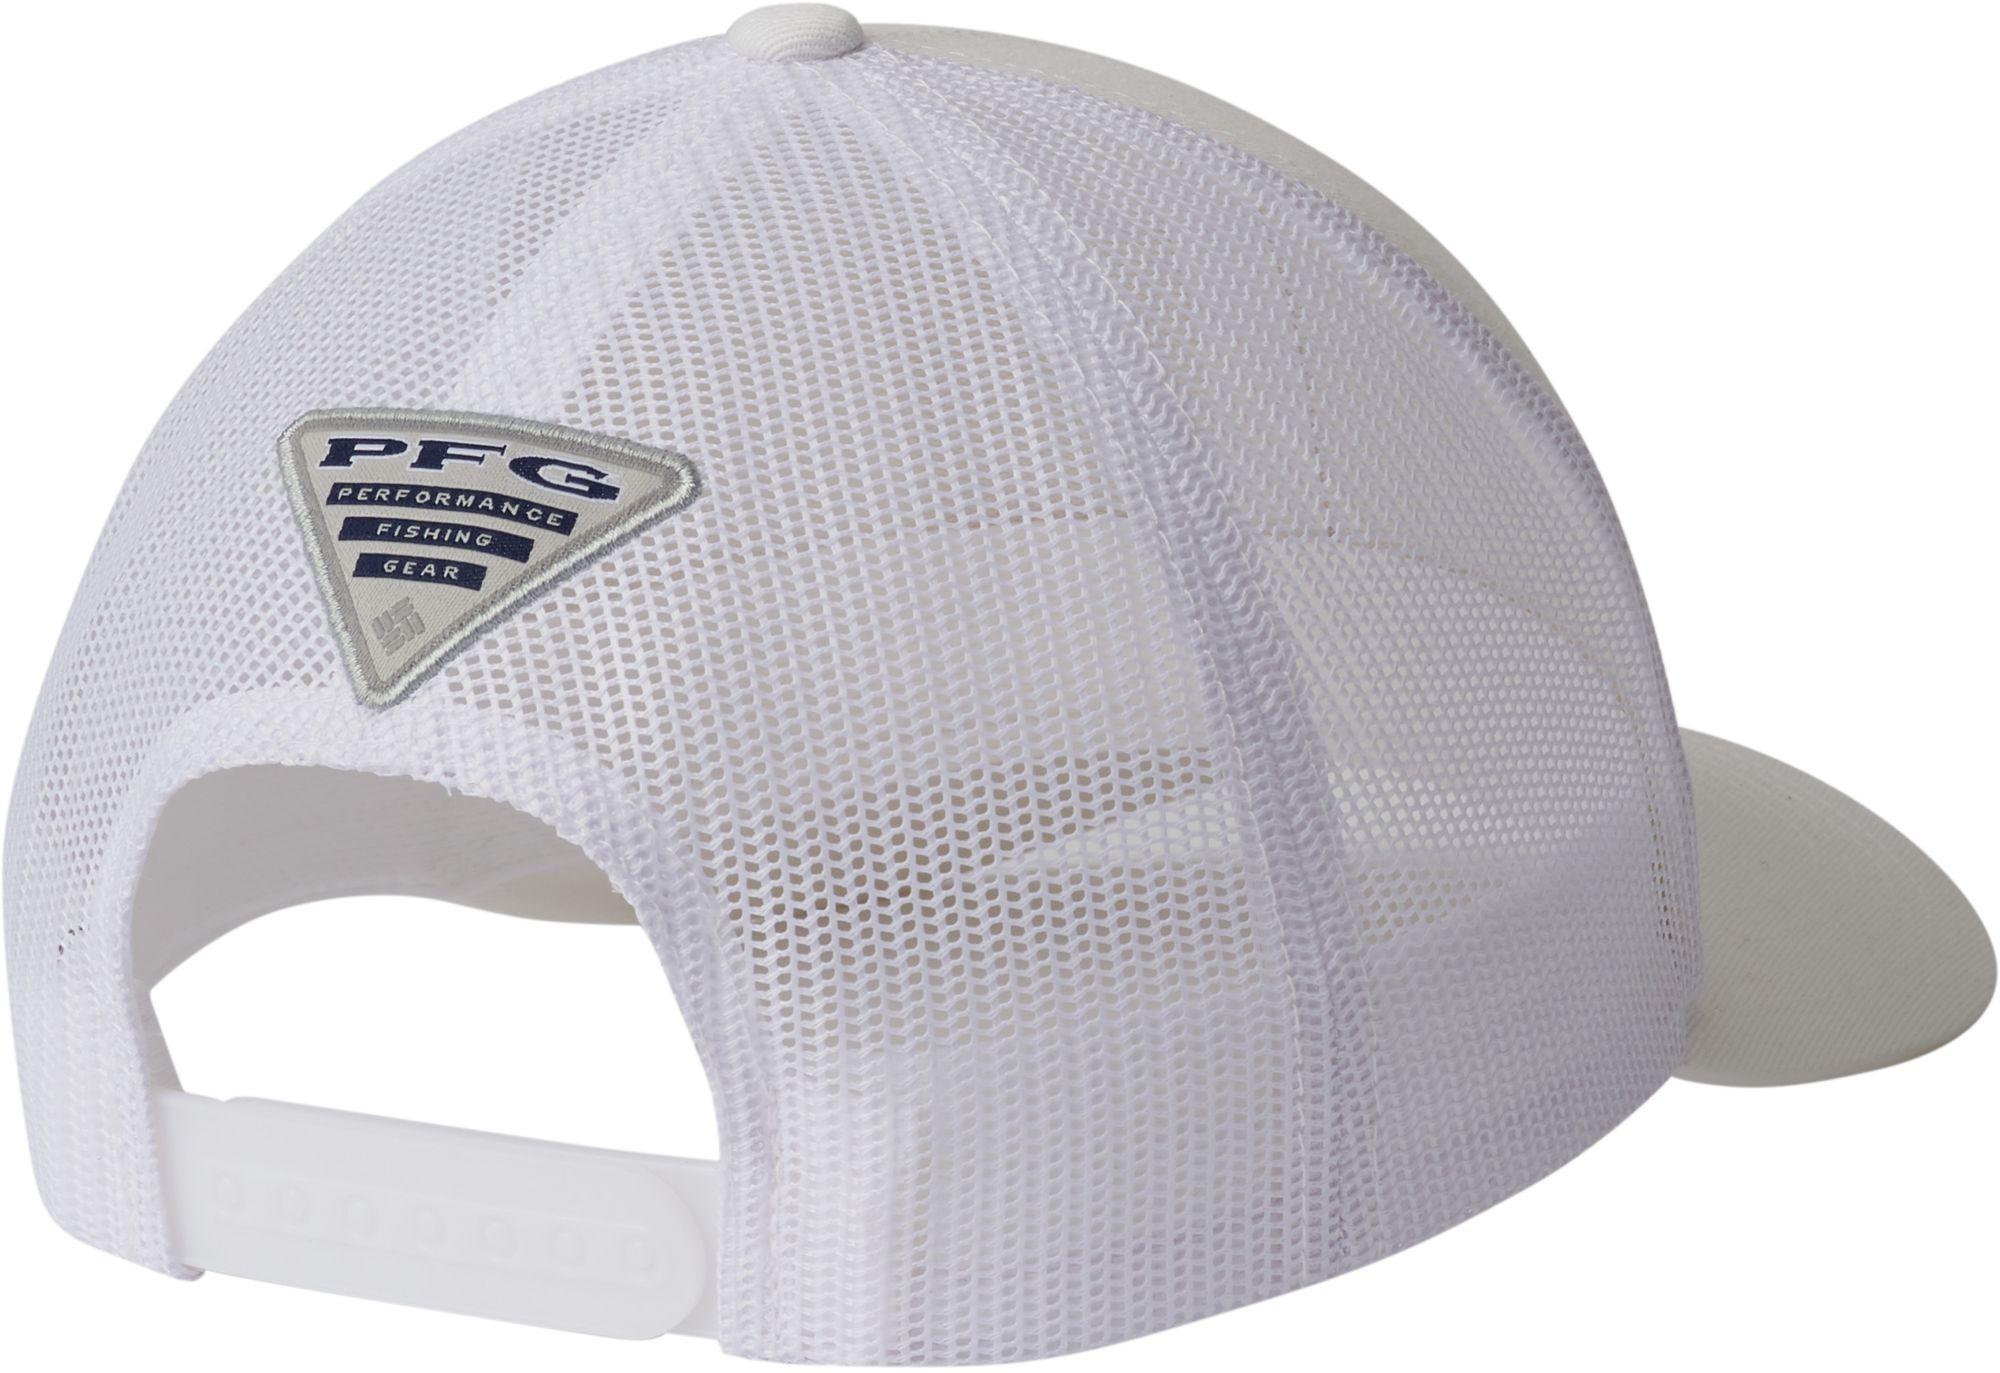 bdaaf4dd Columbia - White Pfg Mesh Snapback Fish Flag Hat for Men - Lyst. View  fullscreen